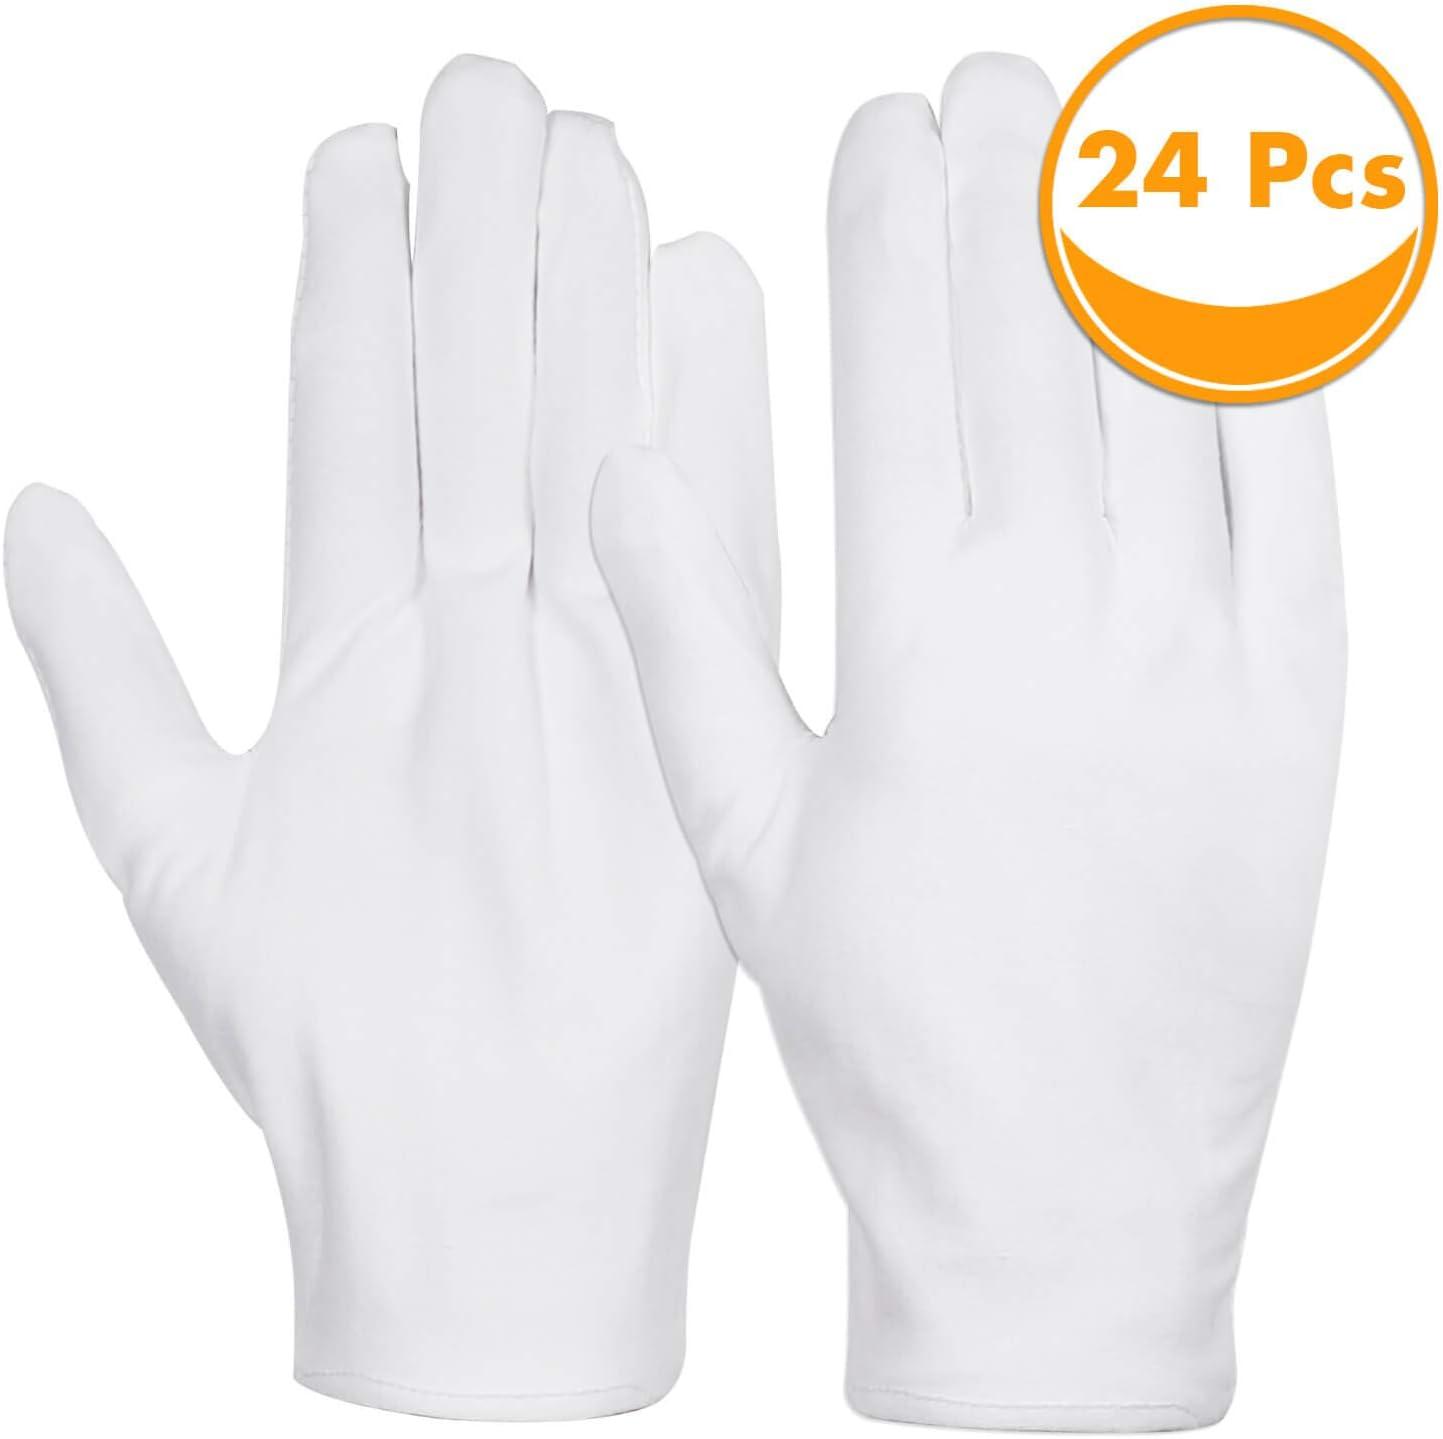 White X-Large Bx//12 pr Bulk Cotton Gloves